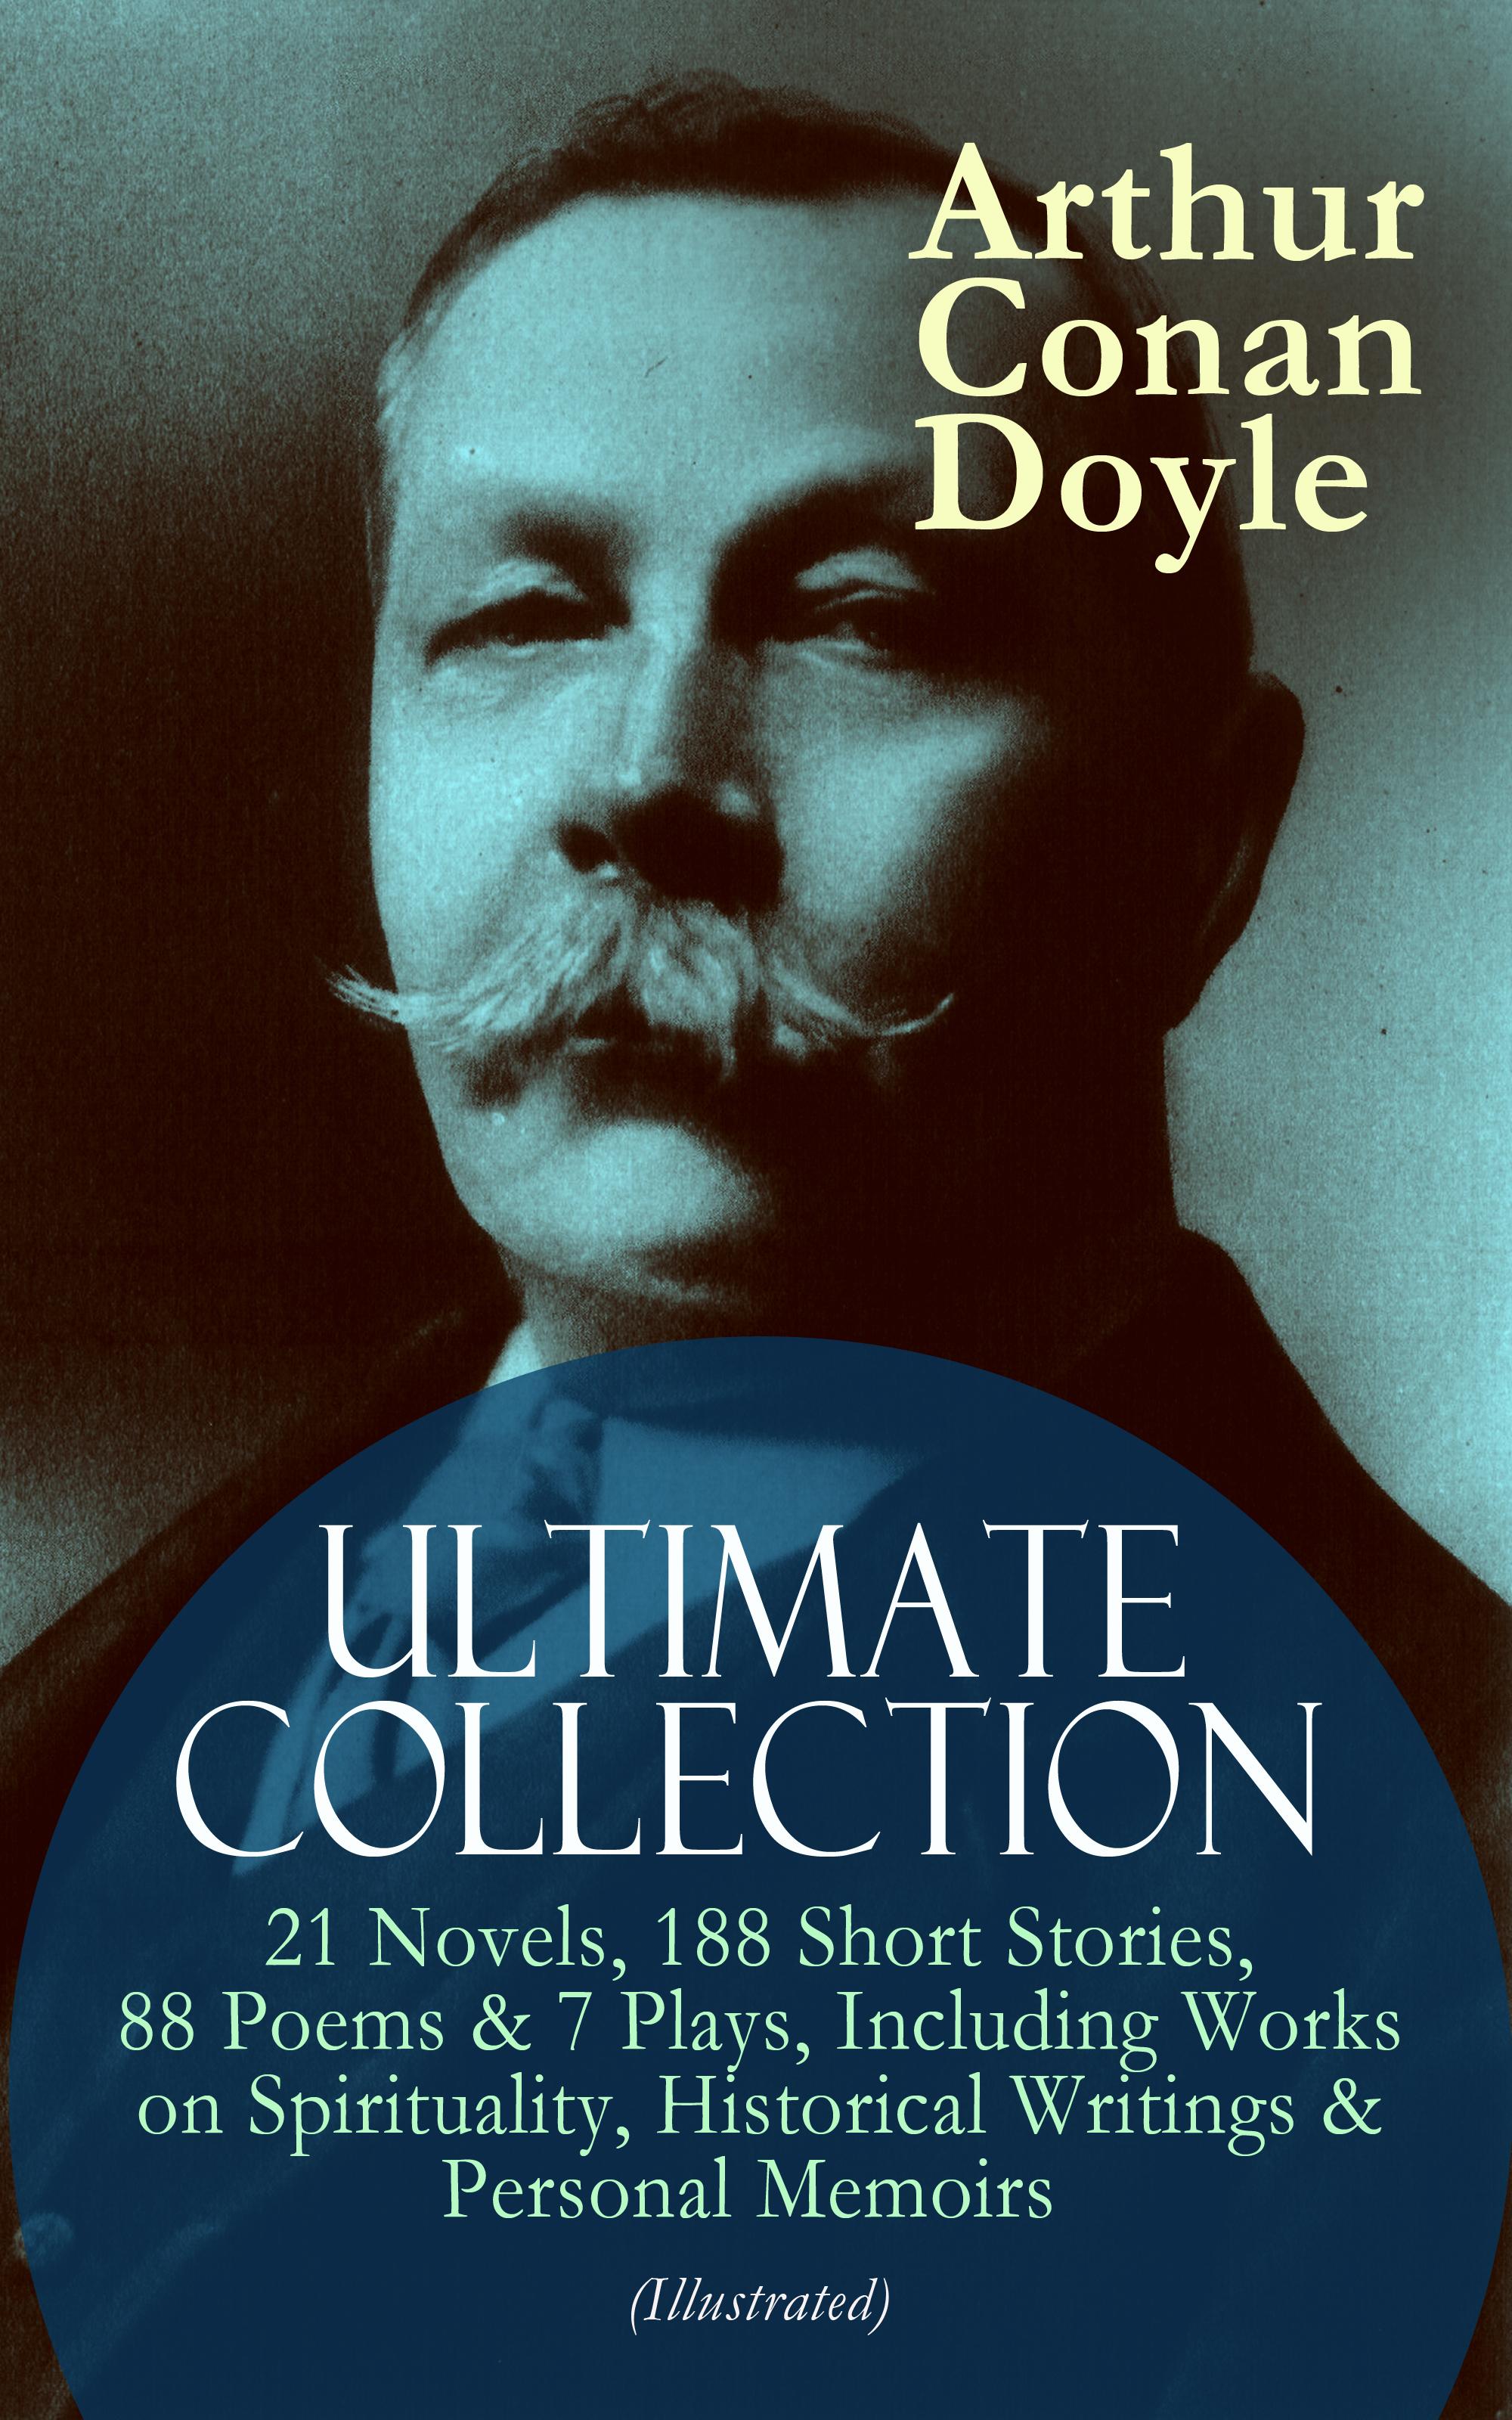 Фото - Arthur Conan Doyle ARTHUR CONAN DOYLE Ultimate Collection: 21 Novels, 188 Short Stories, 88 Poems & 7 Plays, Including Works on Spirituality, Historical Writings & Personal Memoirs (Illustrated) conan